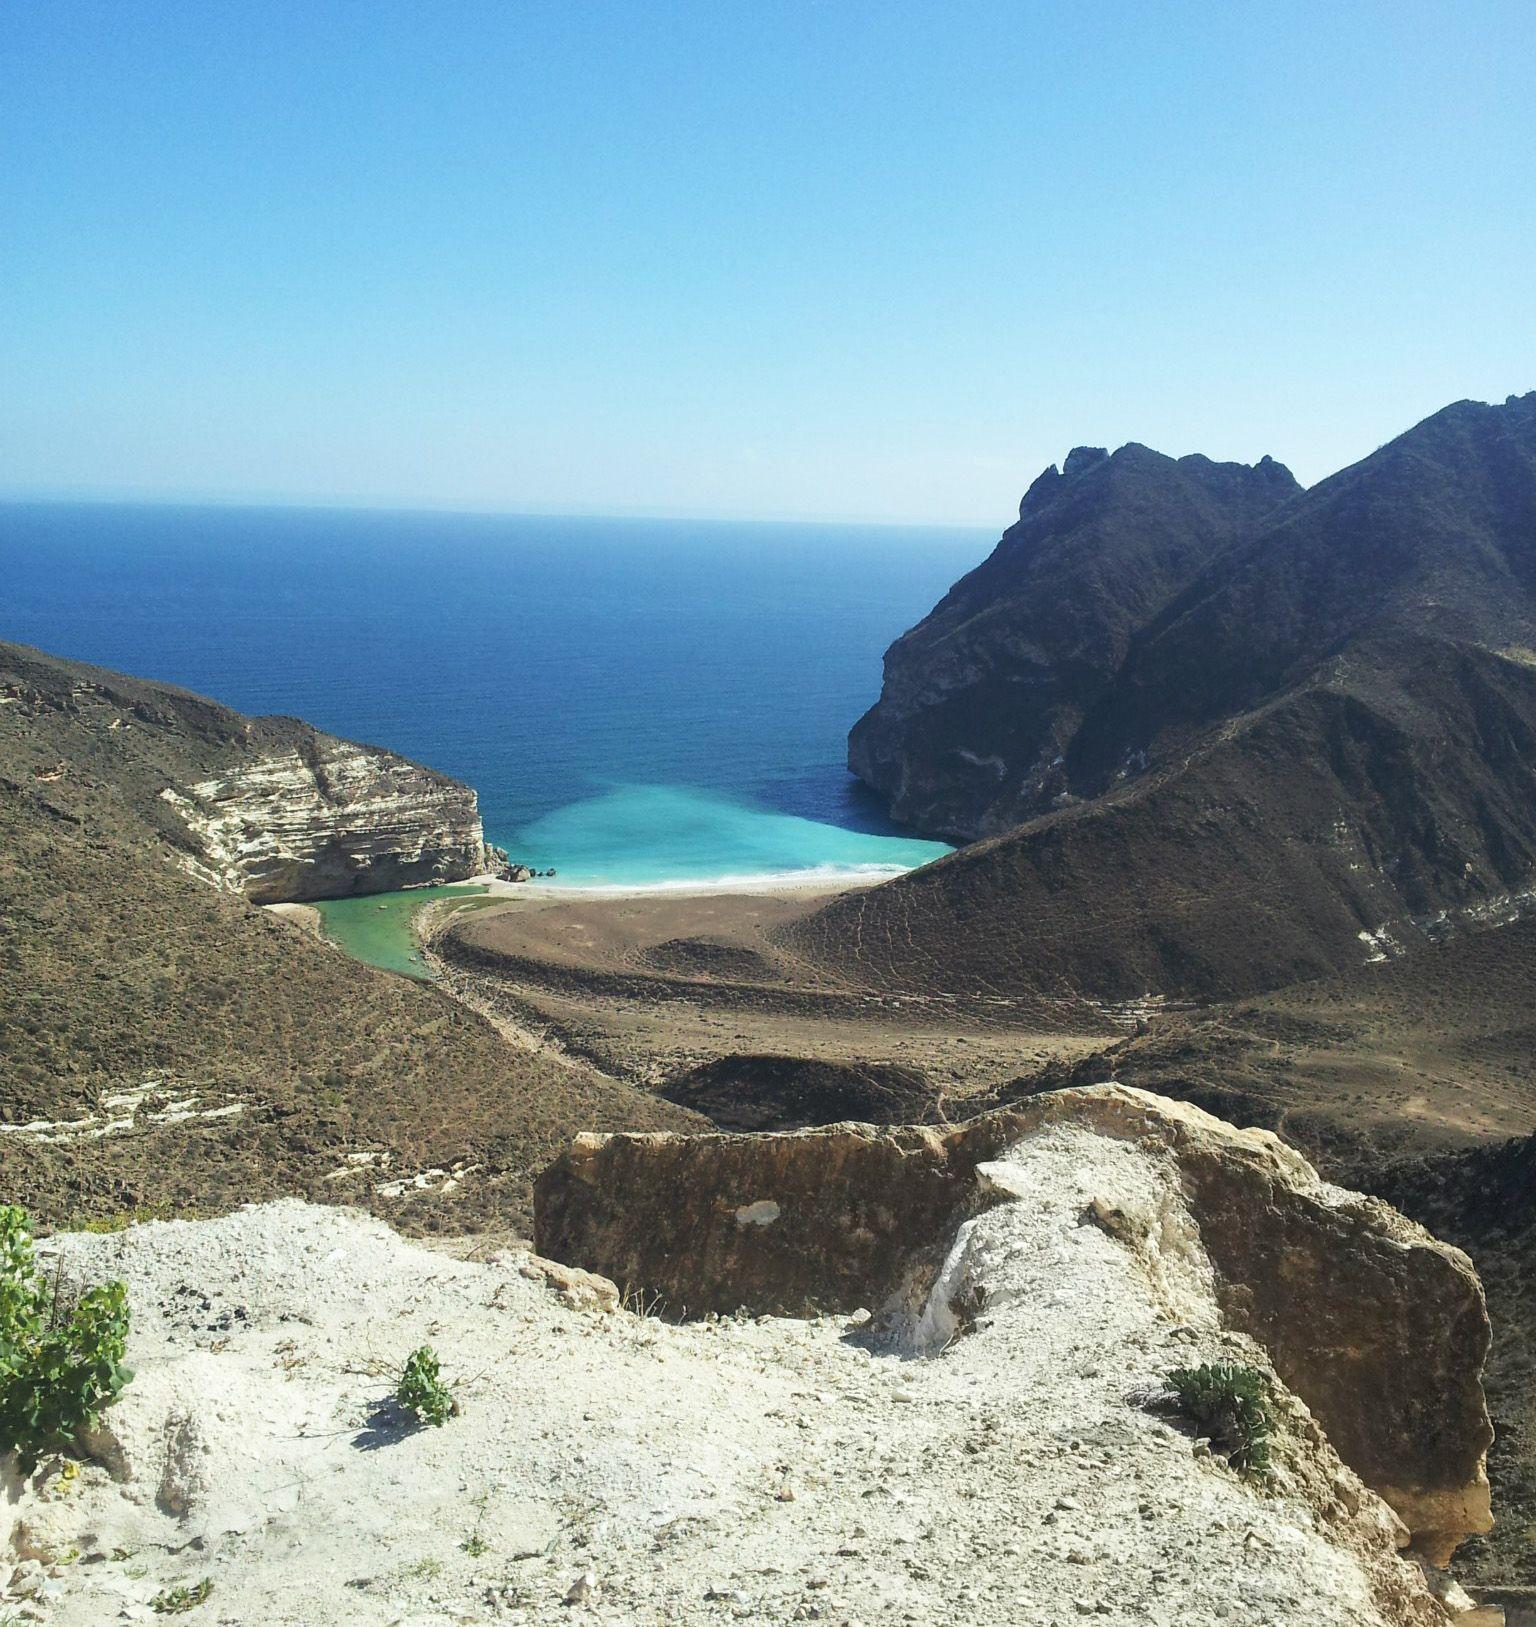 Oman | Mughsayl Bay Beach. credit: Issa Ali. view on Fb https://www.facebook.com/OmanPocketGuide #oman #traveltooman #destination